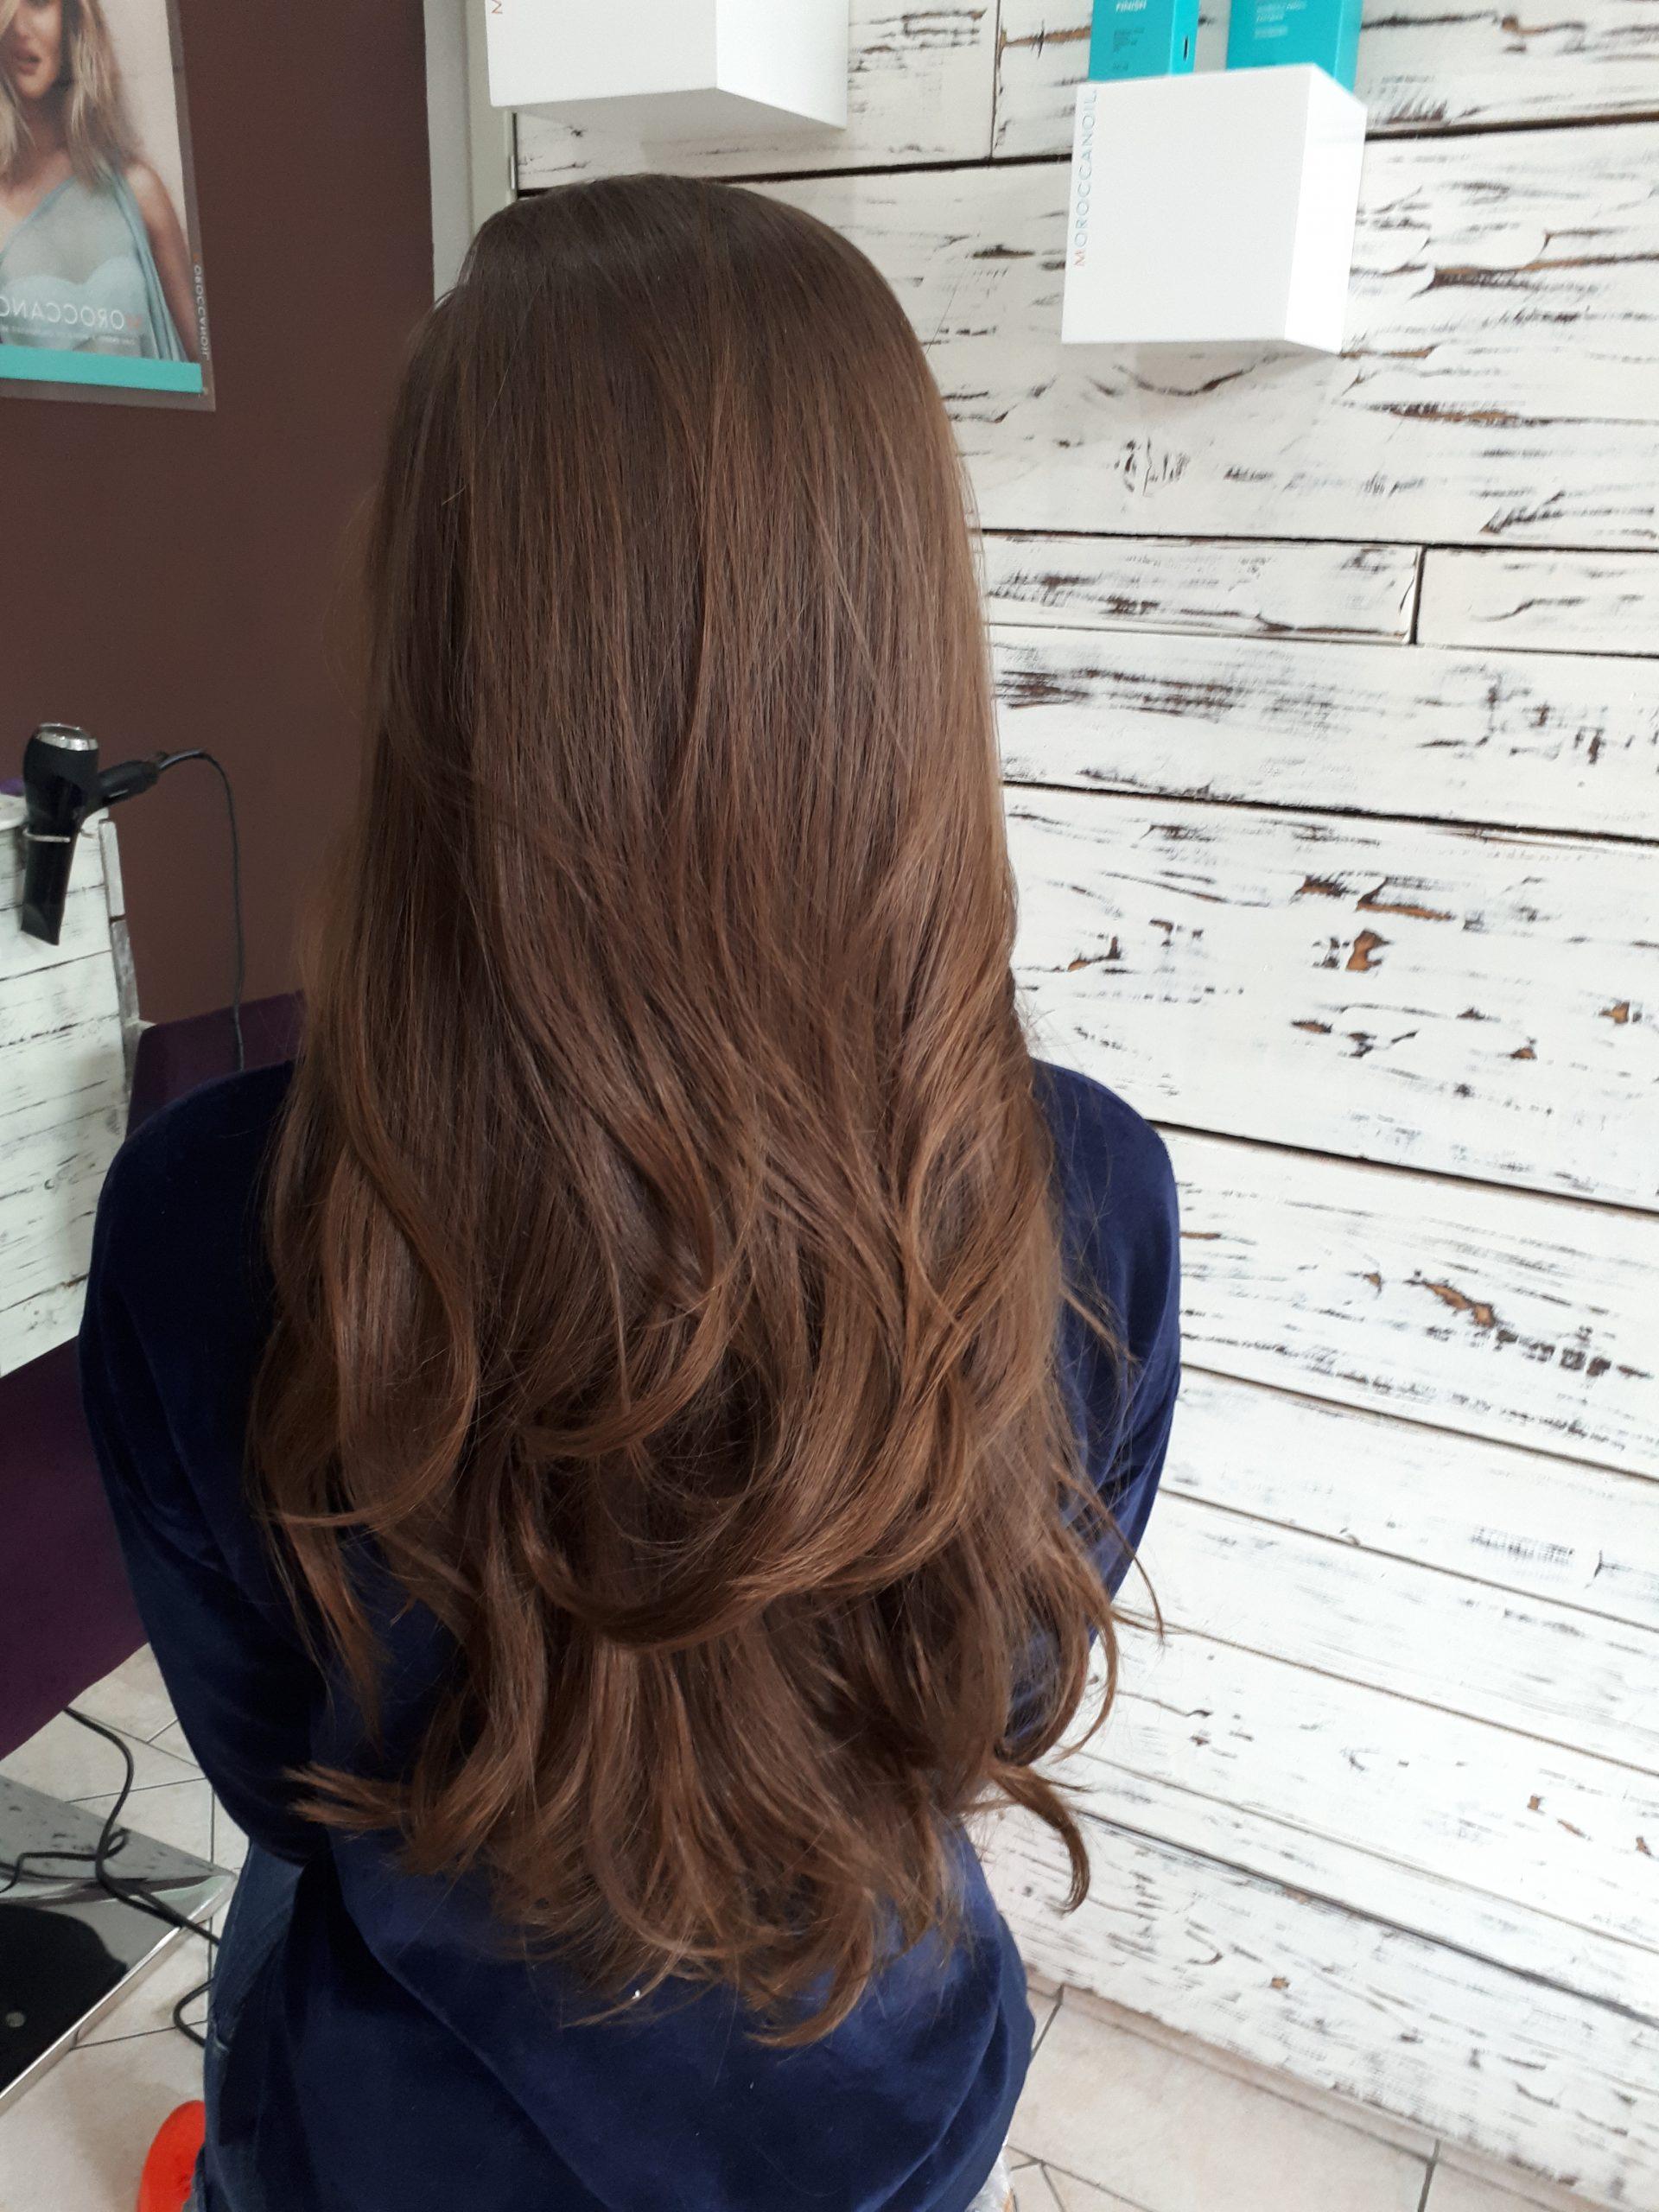 Layered wavy hair